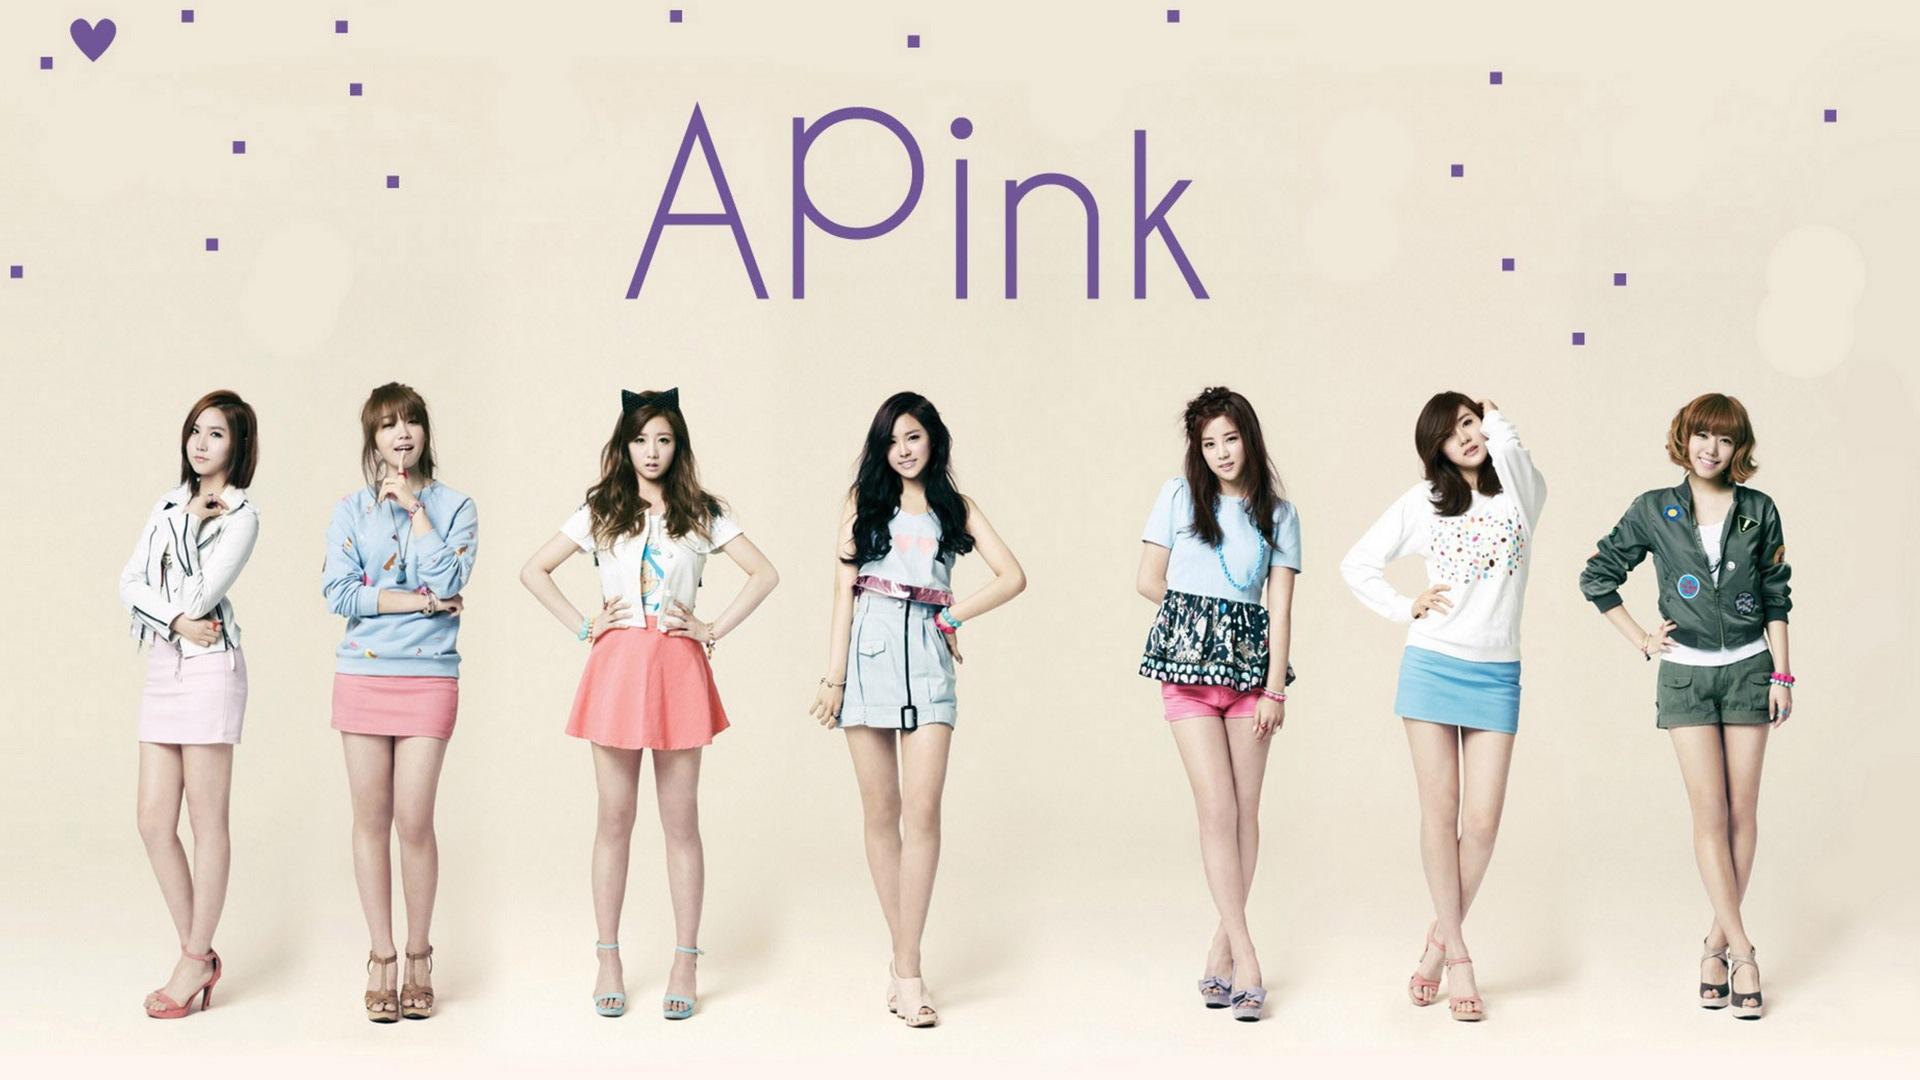 Korean Music Girl Group A Pink Hd Wallpapers 2 1920x1080